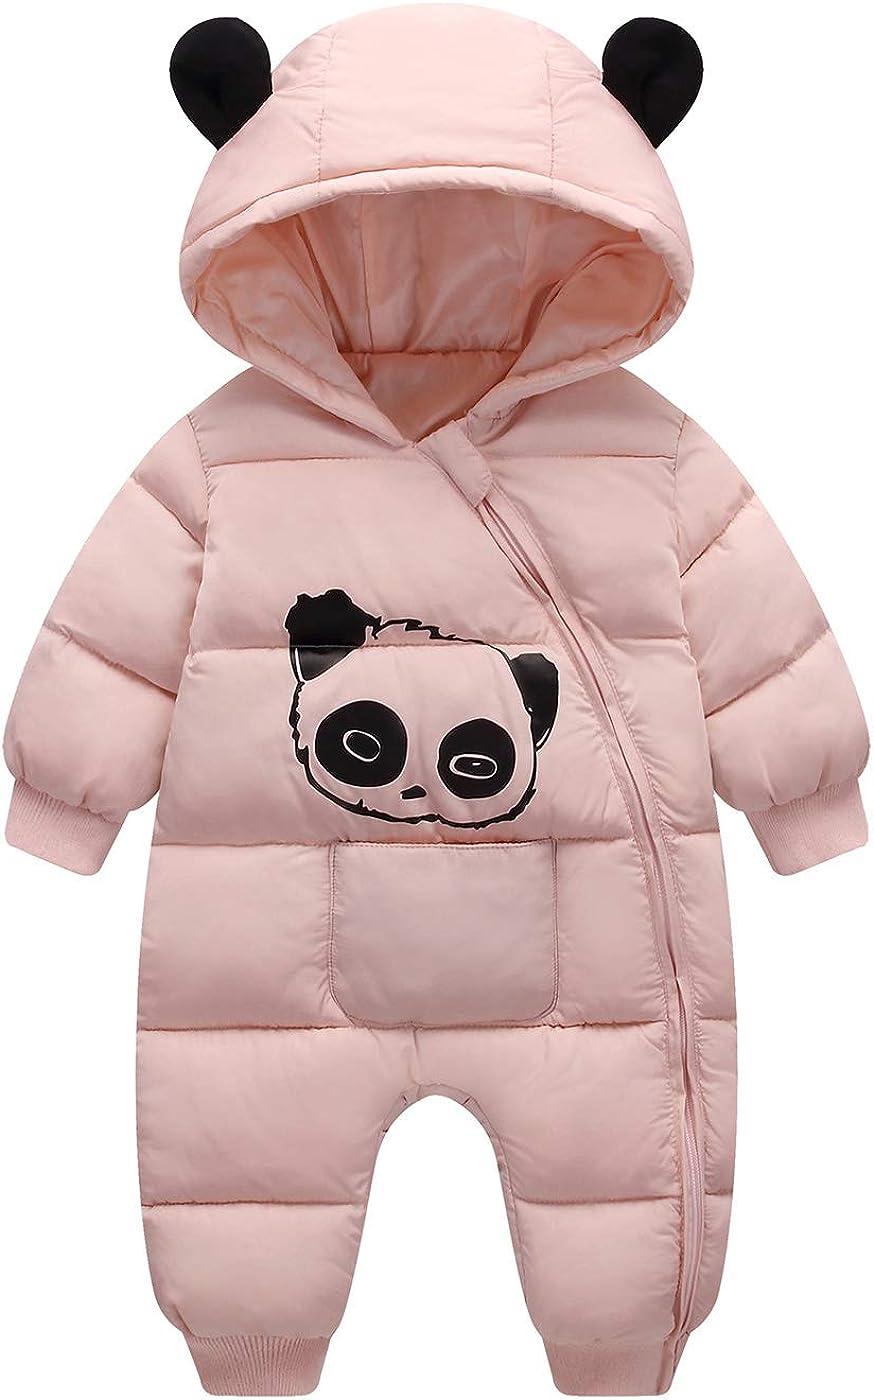 Yanzi6 Baby Newborn Infant Girls Boys Short Sleeve One Piece Romper